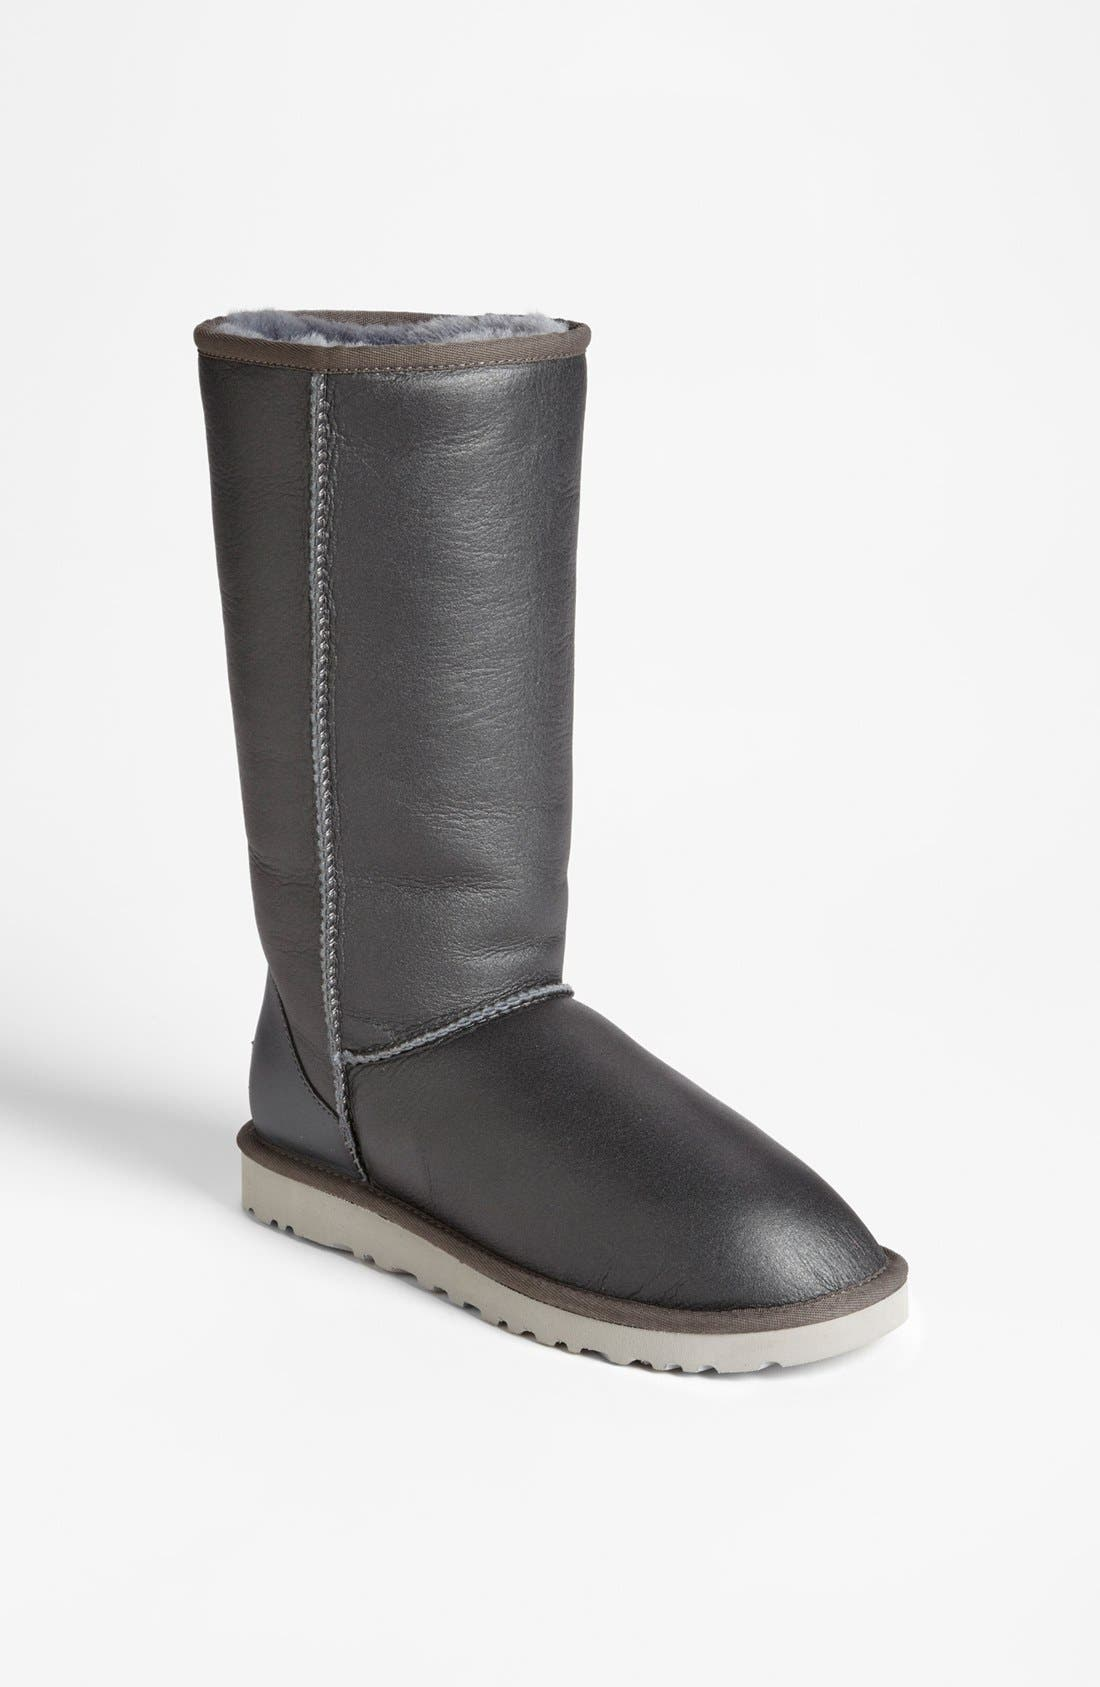 Main Image - UGG® Australia 'Classic Tall Metallic' Boot (Women)